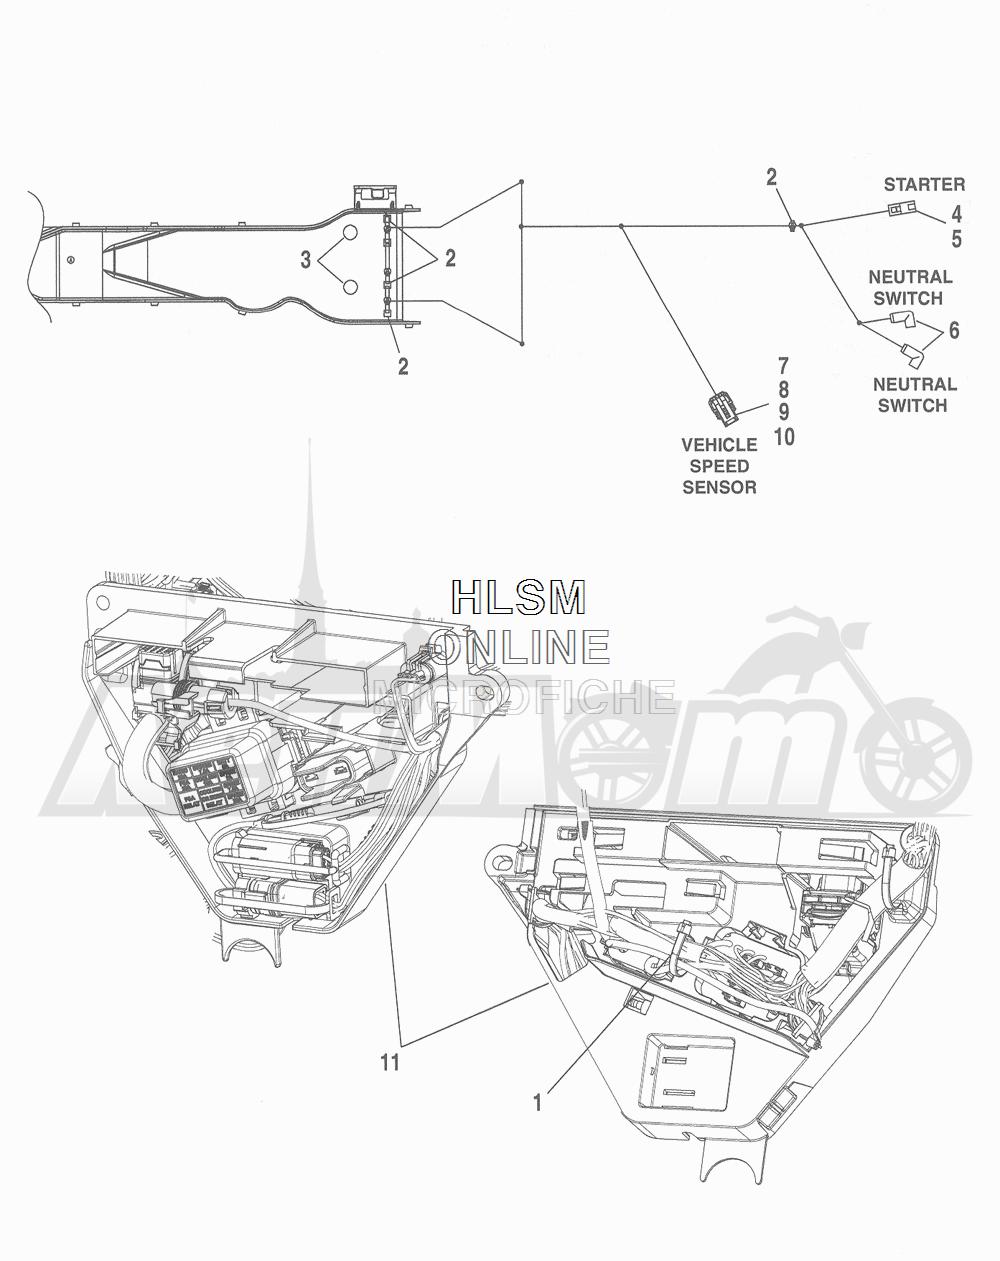 Запчасти для Мотоцикла Harley-Davidson 2016 FLHTCU 103 ULTRA CLASSIC ELECTRAGLIDE (FCM) Раздел: WIRING HARNESS_ MAIN - ABS (FAIRING MODELS) - 6 | электропроводка главный жгут ABS (модели с обтекателем) 6